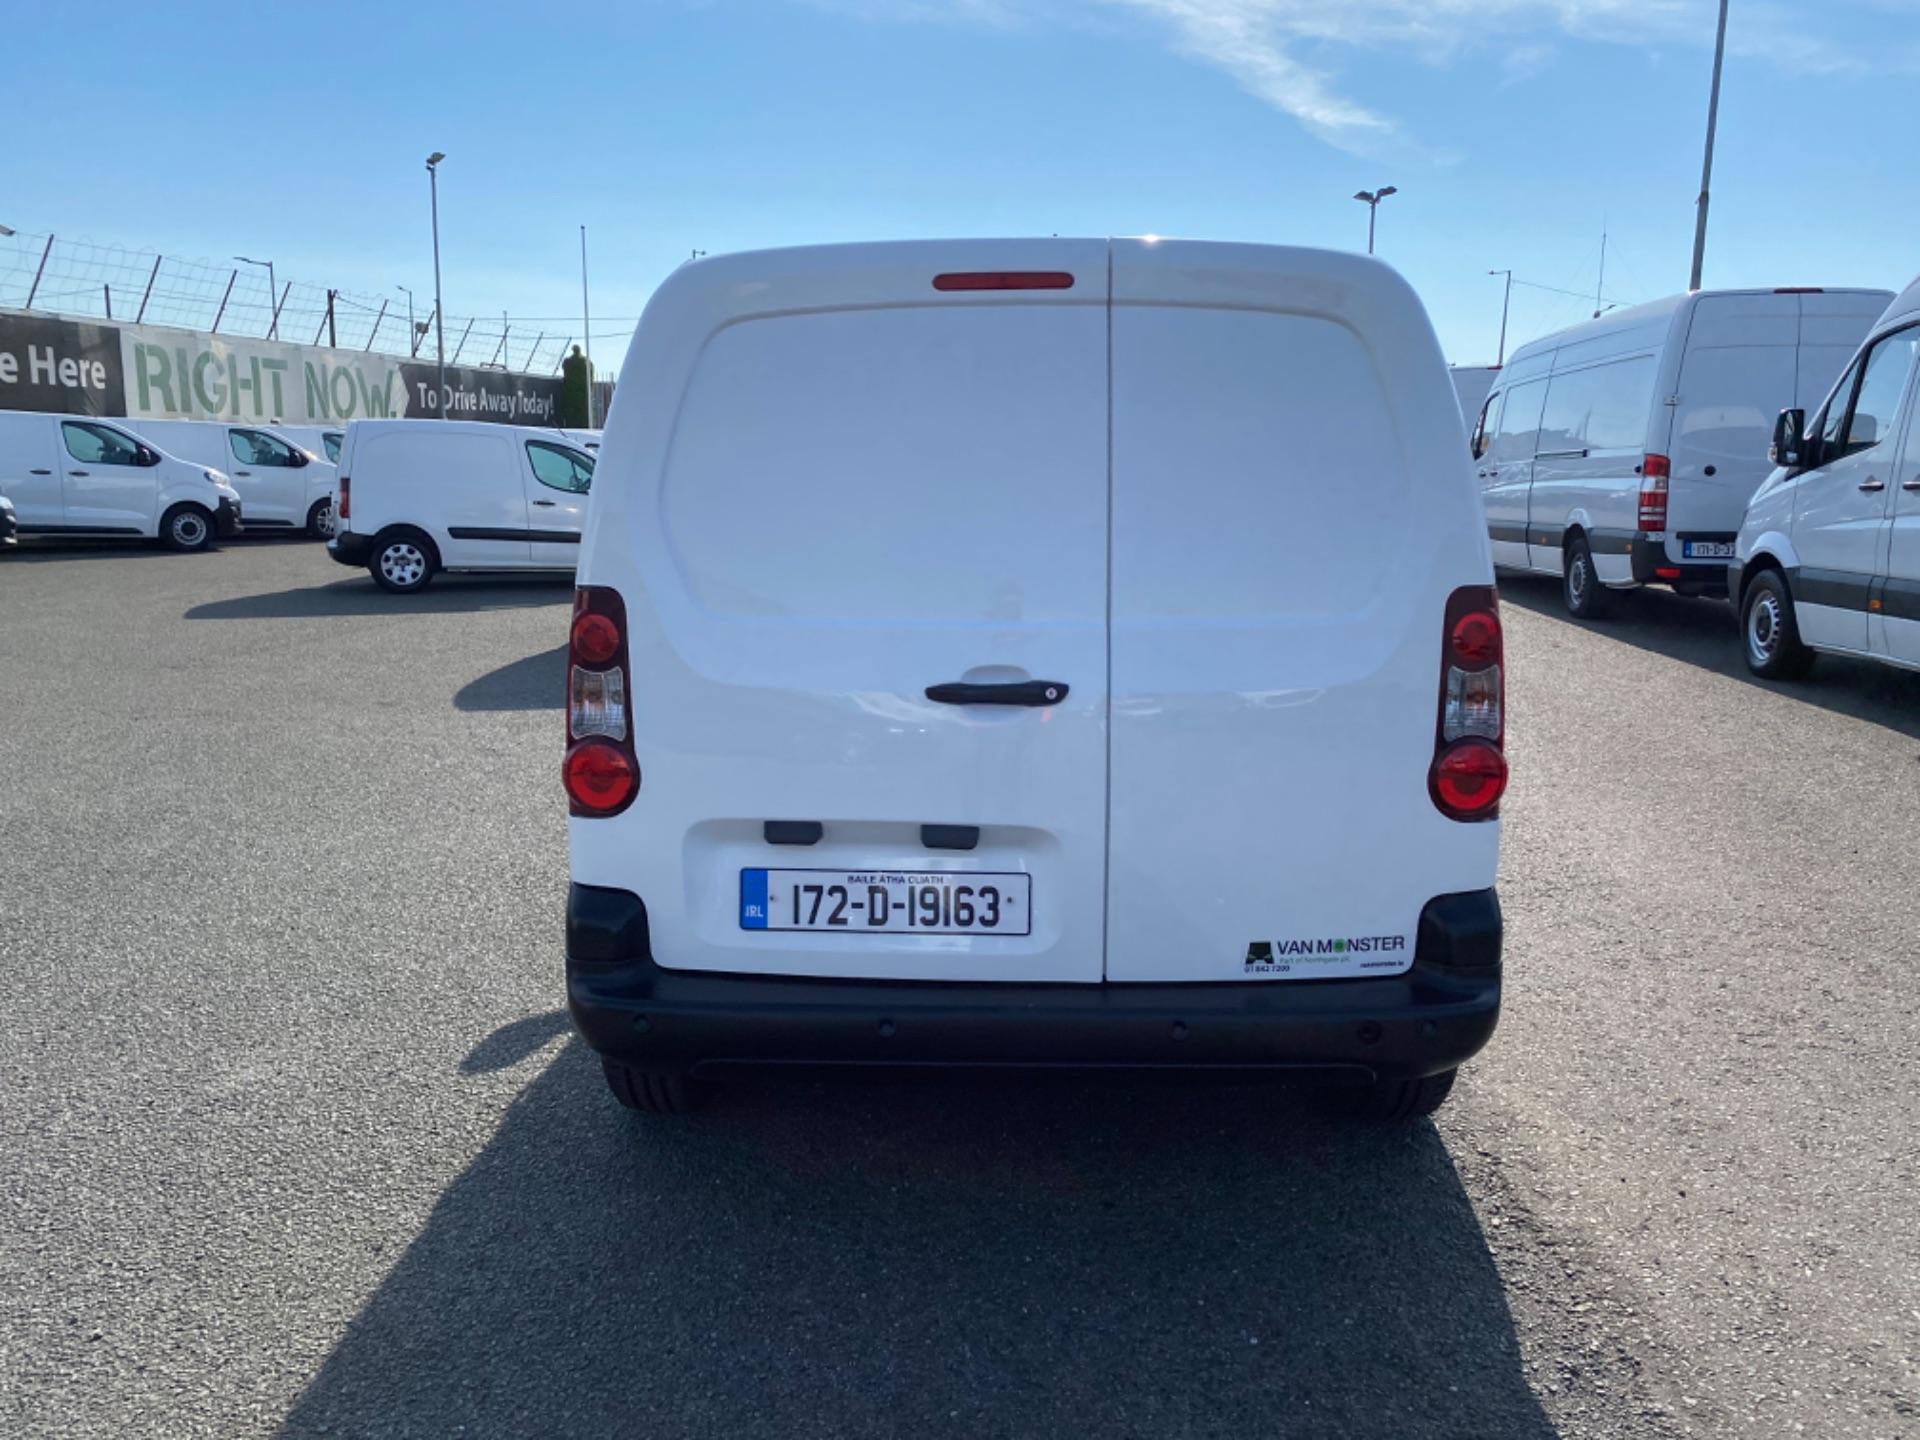 2017 Peugeot Partner Professional 1.6 Blue HDI 100 (172D19163) Image 4